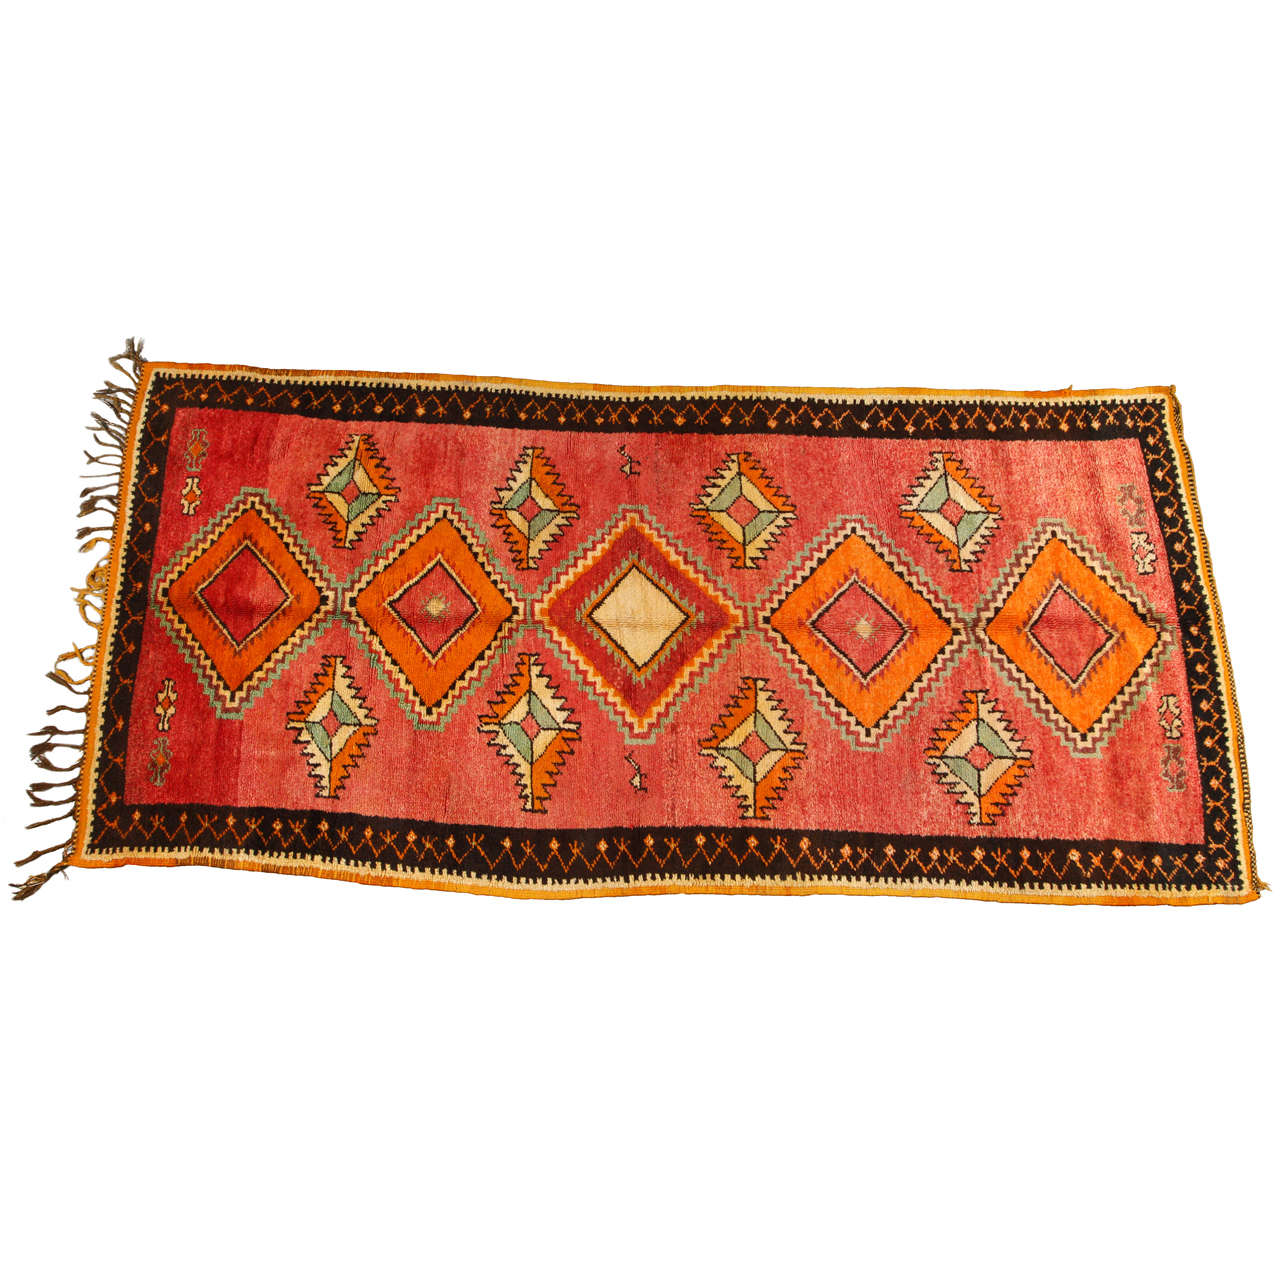 Vintage Moroccan Area Rug For Sale At 1stdibs: Vintage Moroccan Tribal Rug Runner Matisse Style For Sale